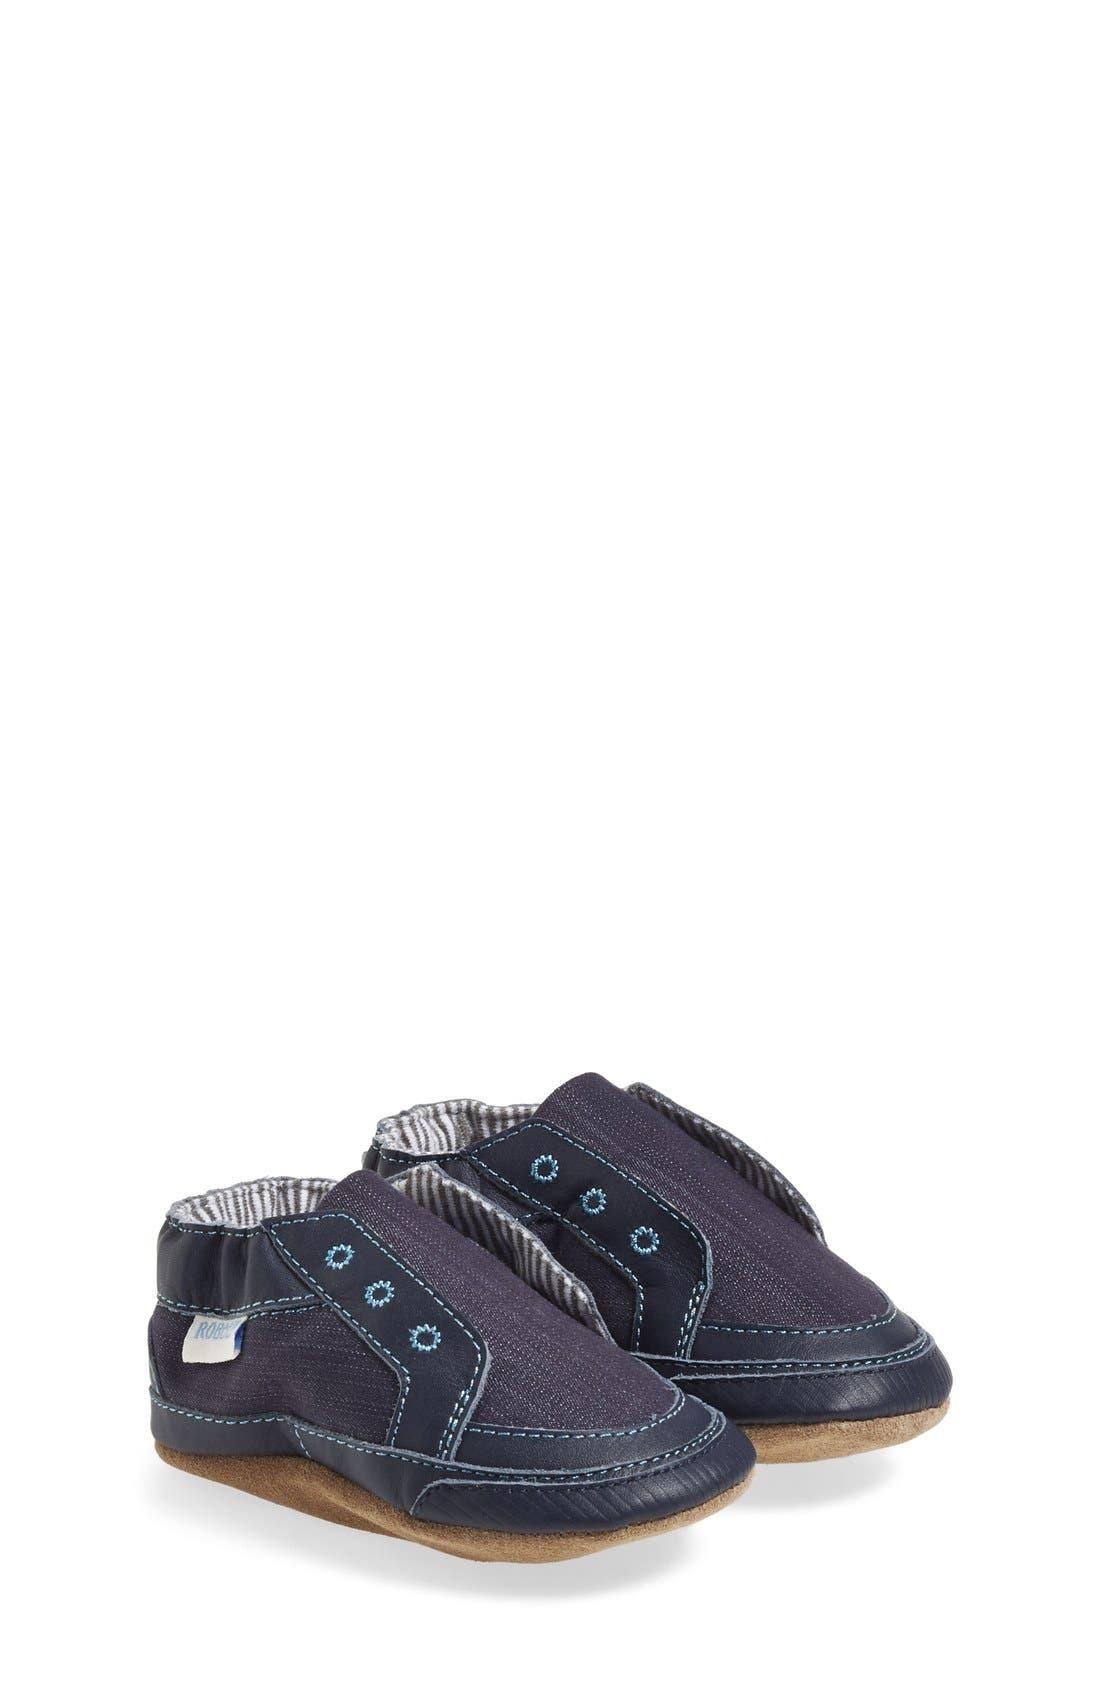 ROBEEZ® 'Stylish Steve' Crib Shoe